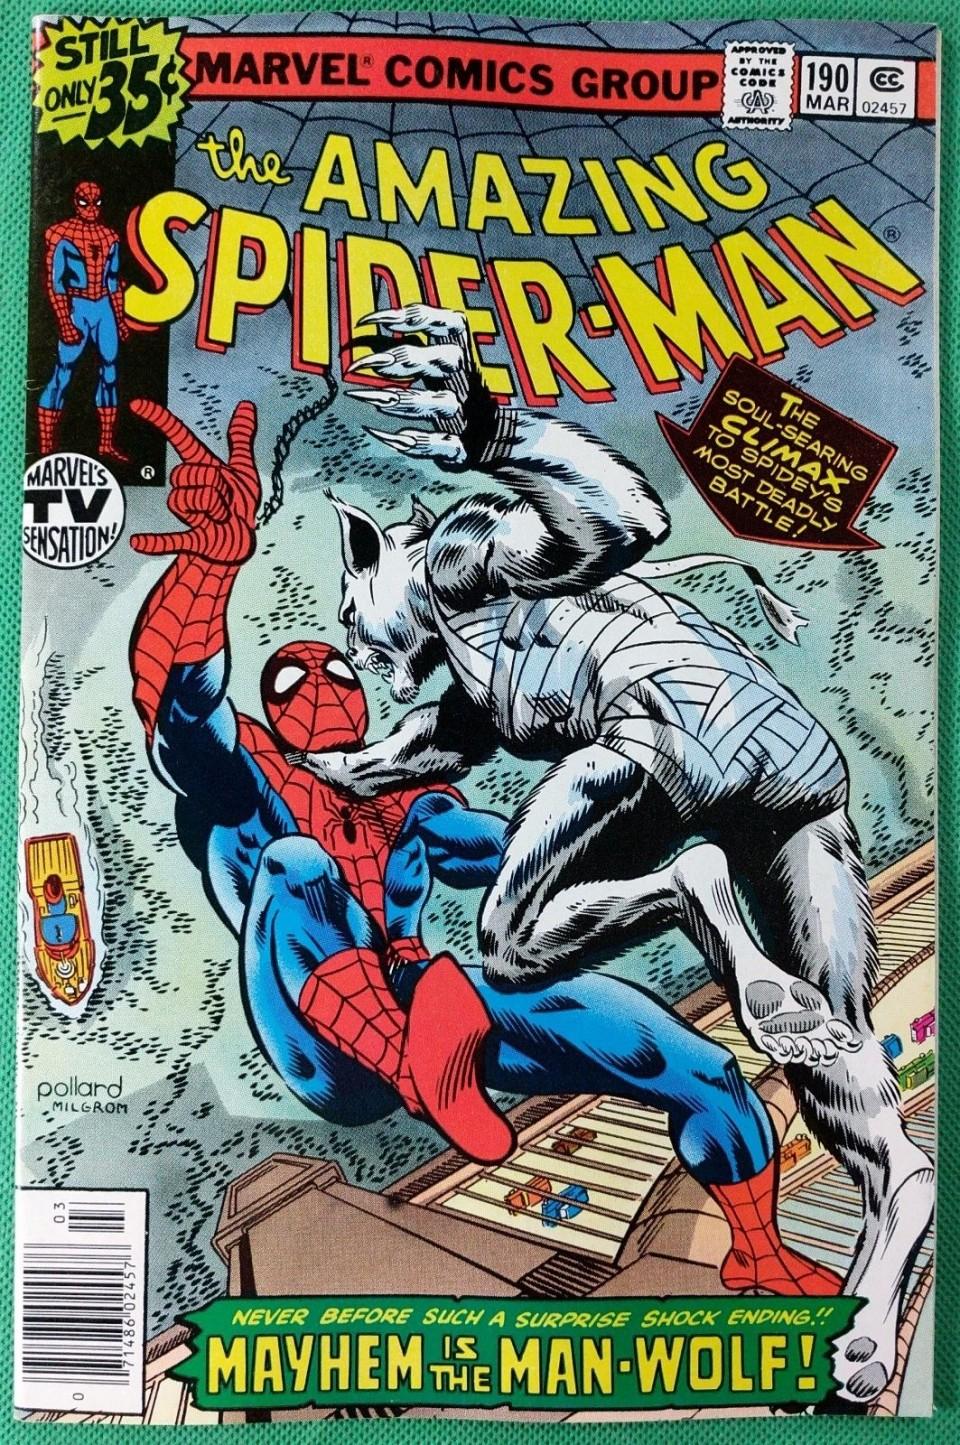 Amazing Spider-Man (1963) #190 VF/NM (9 0) vs Man-Wolf with John Byrne art